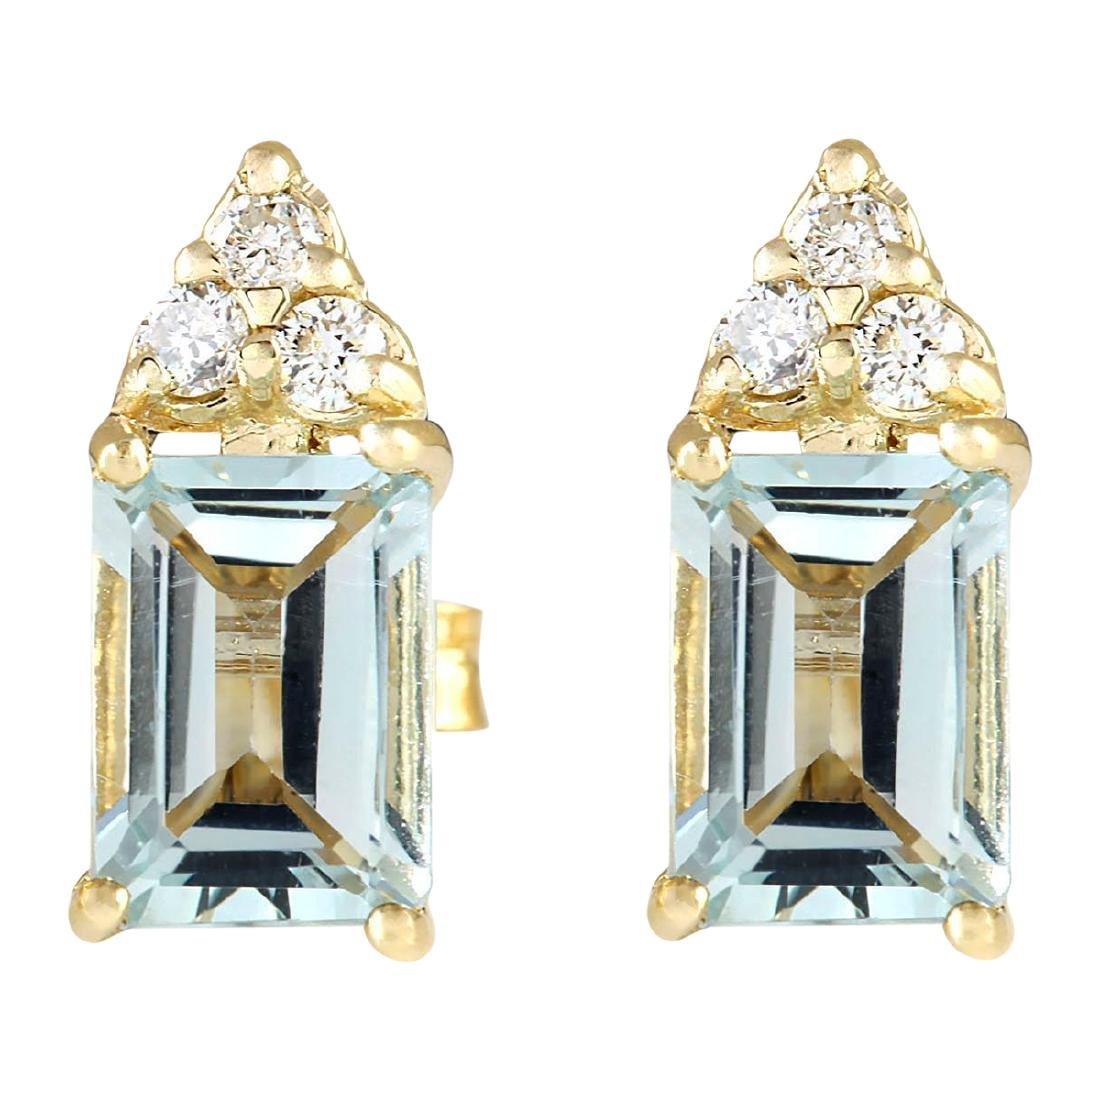 2.65 CTW Natural Aquamarine And Diamond Earrings 18K